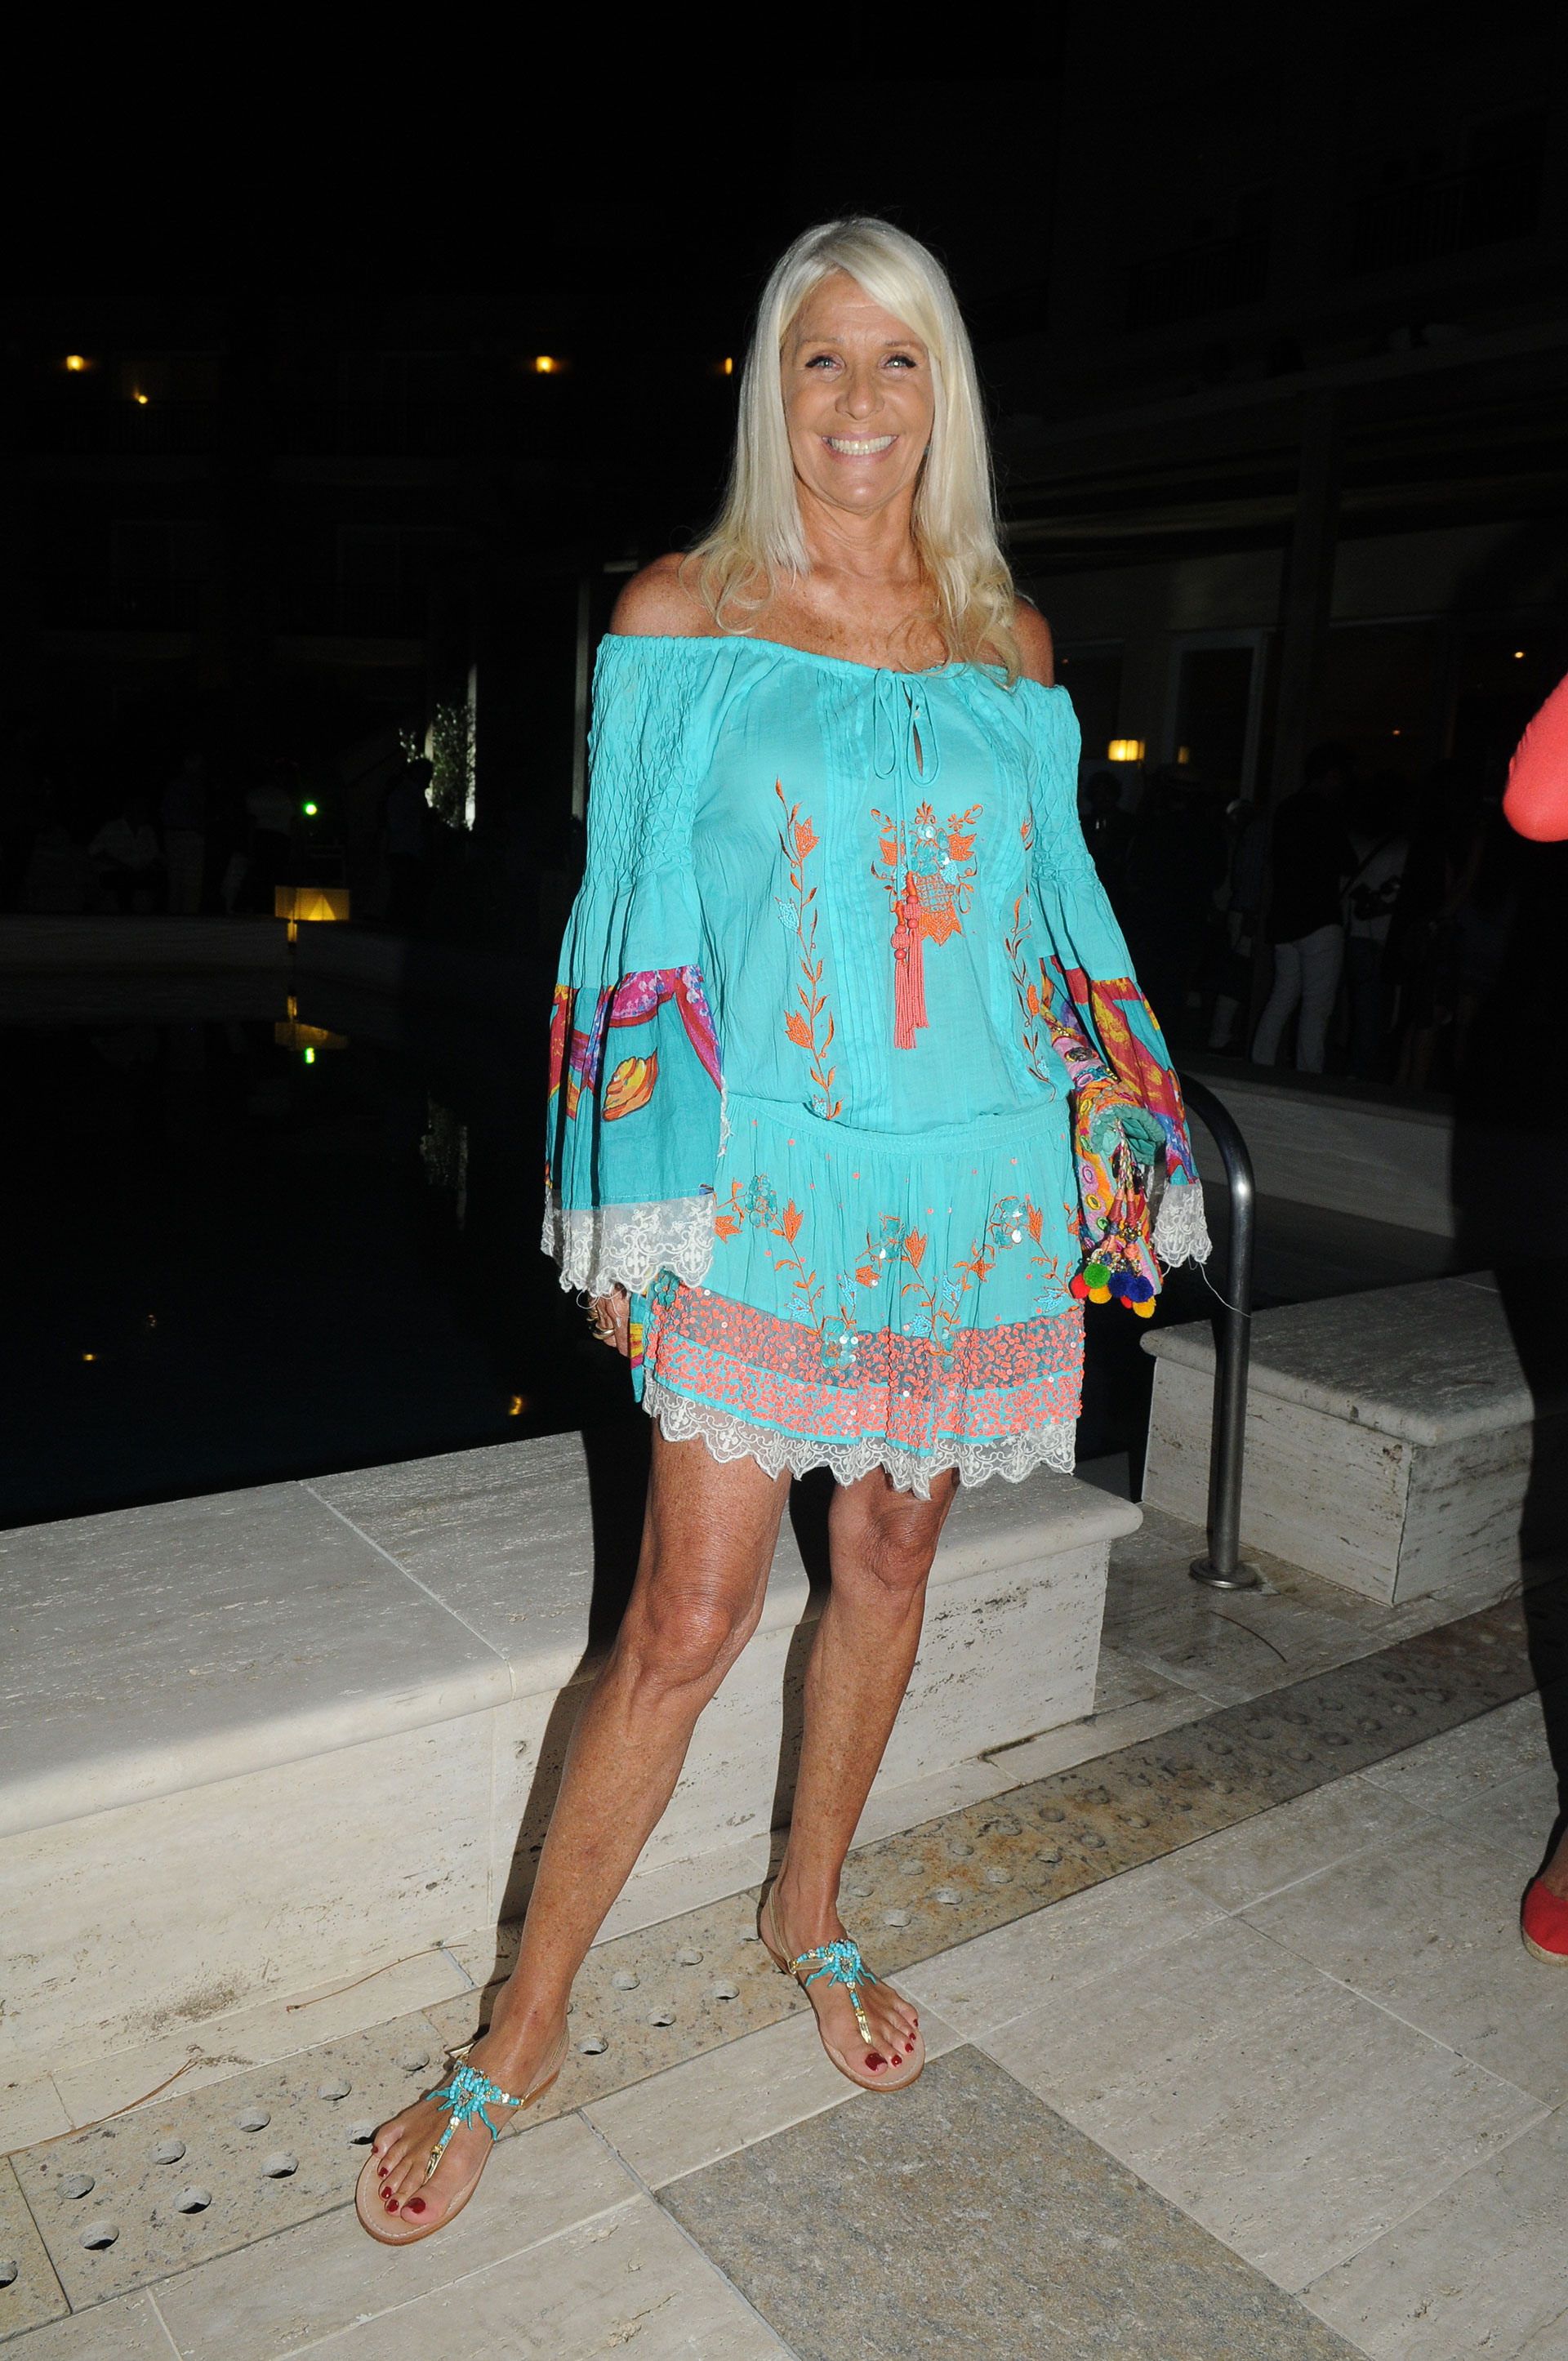 Susana de garcia luna park - 2 part 7